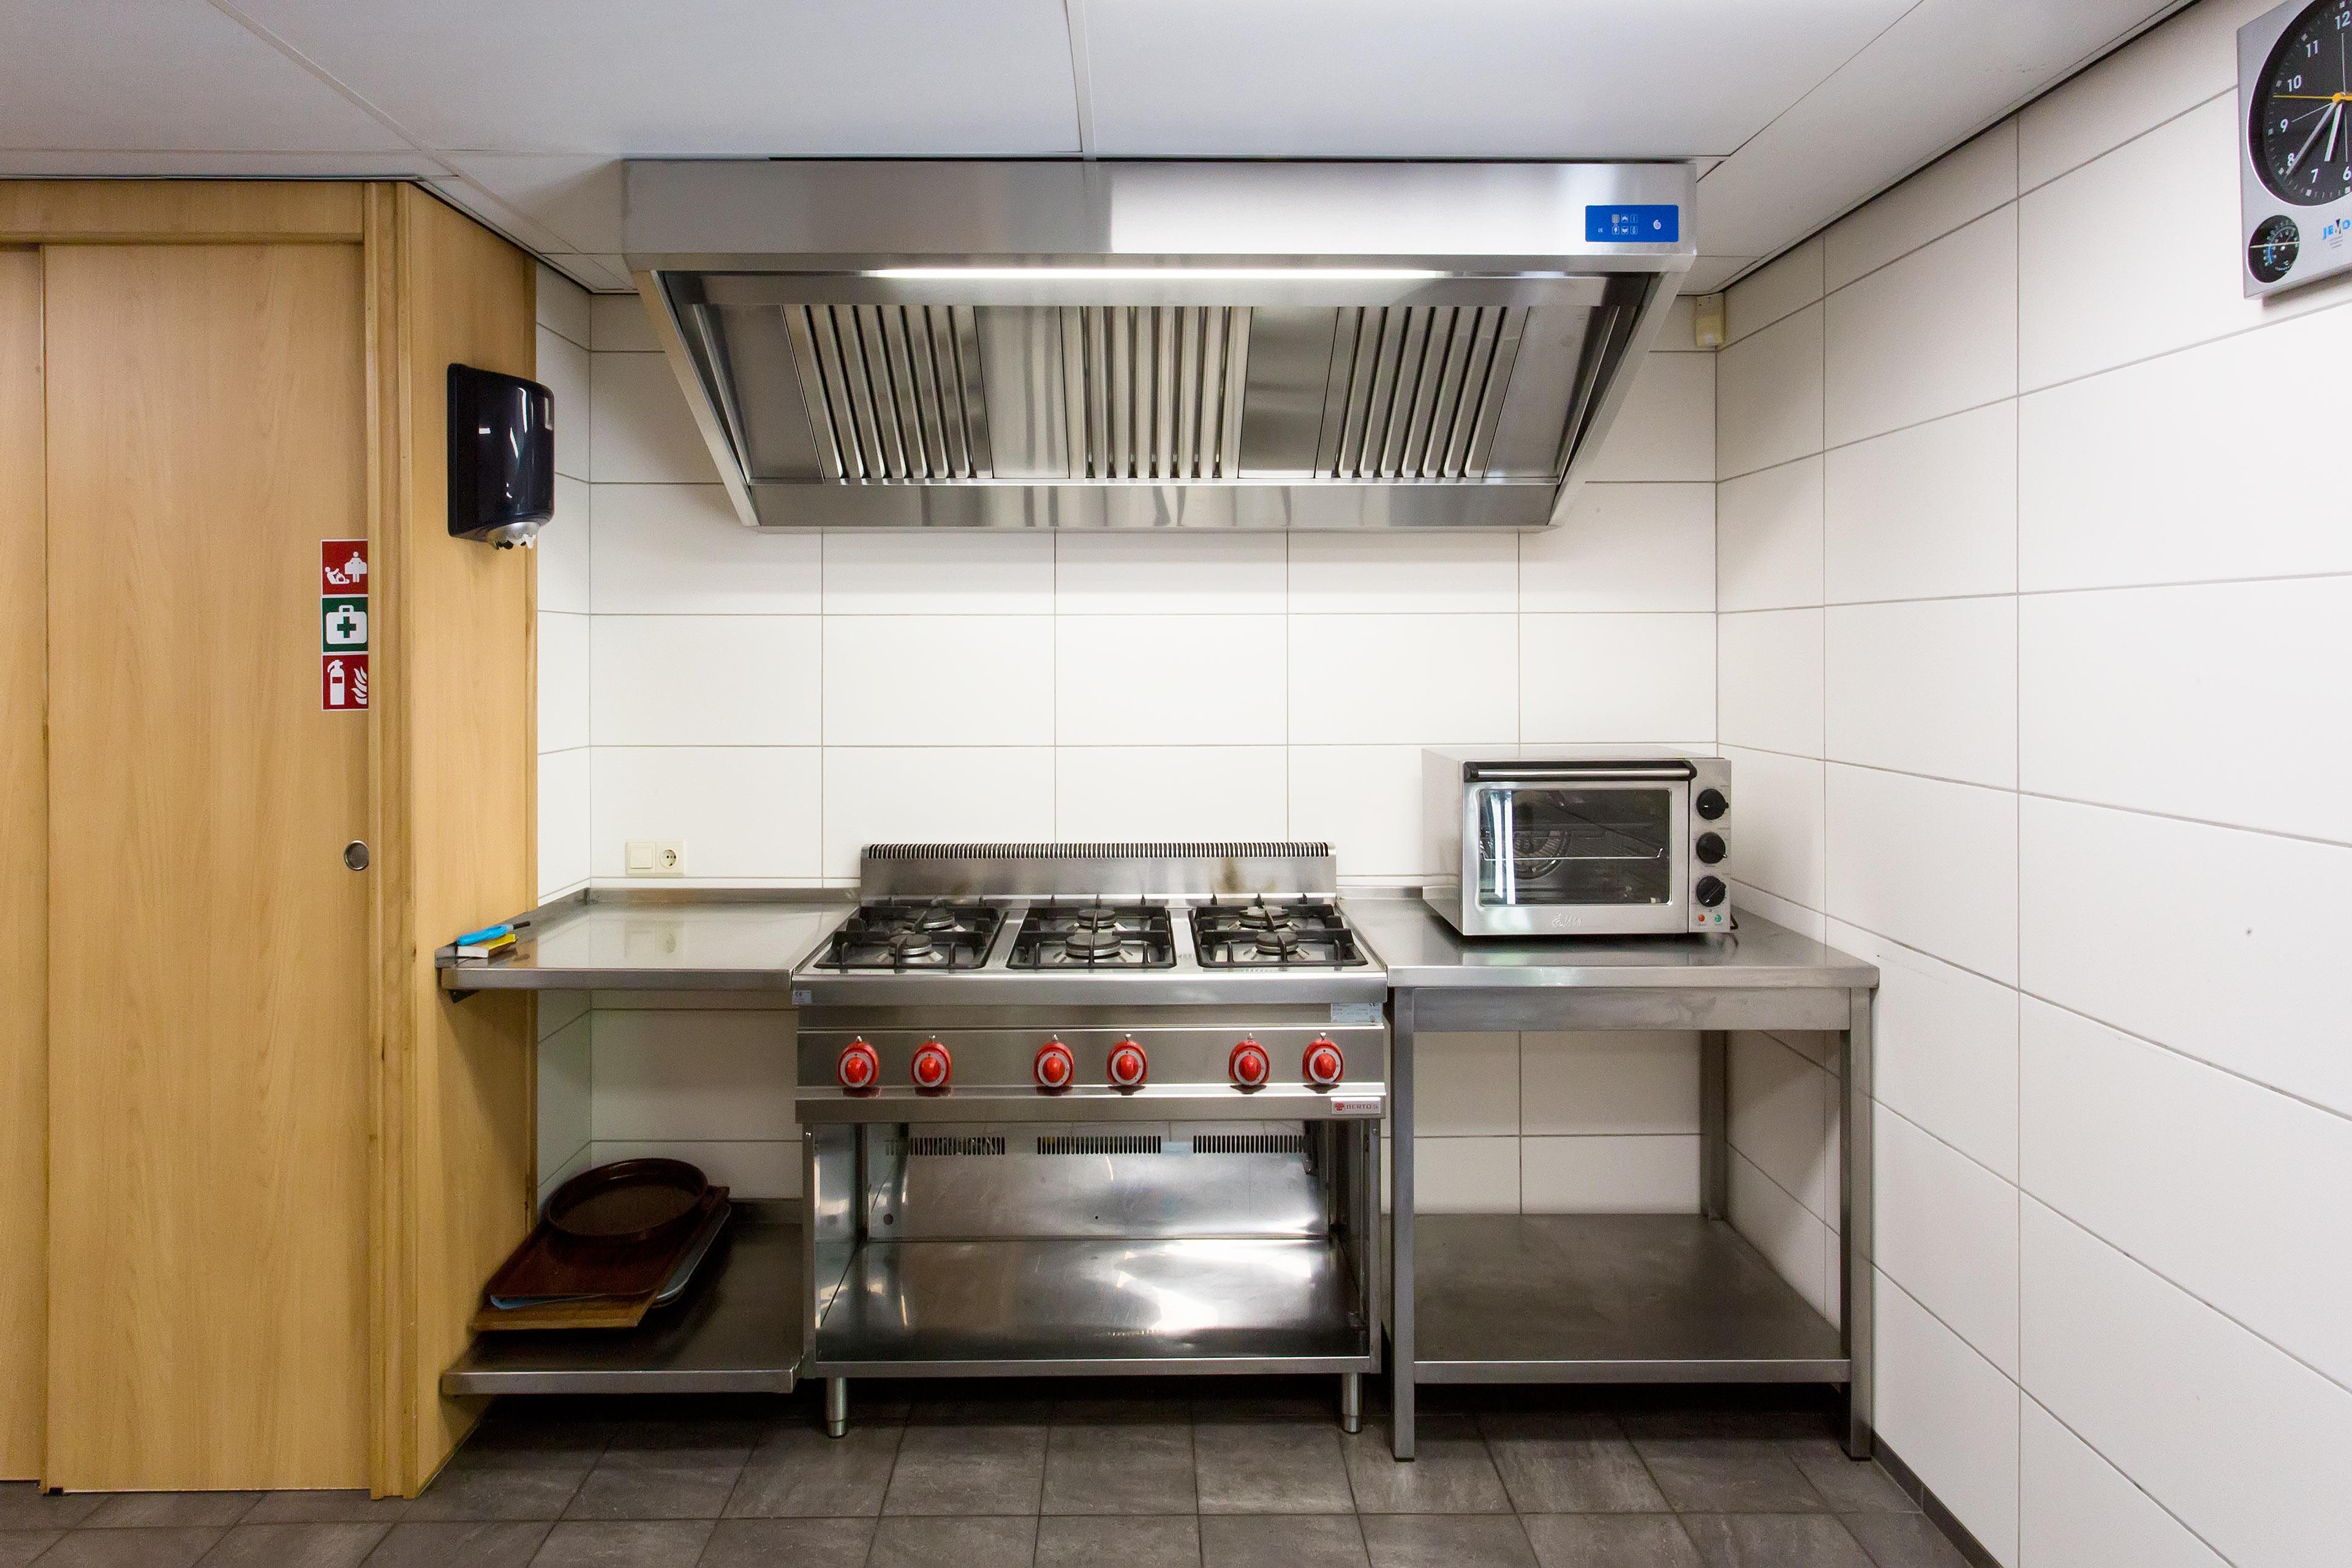 6 pits gasfornuis en helelucht oven